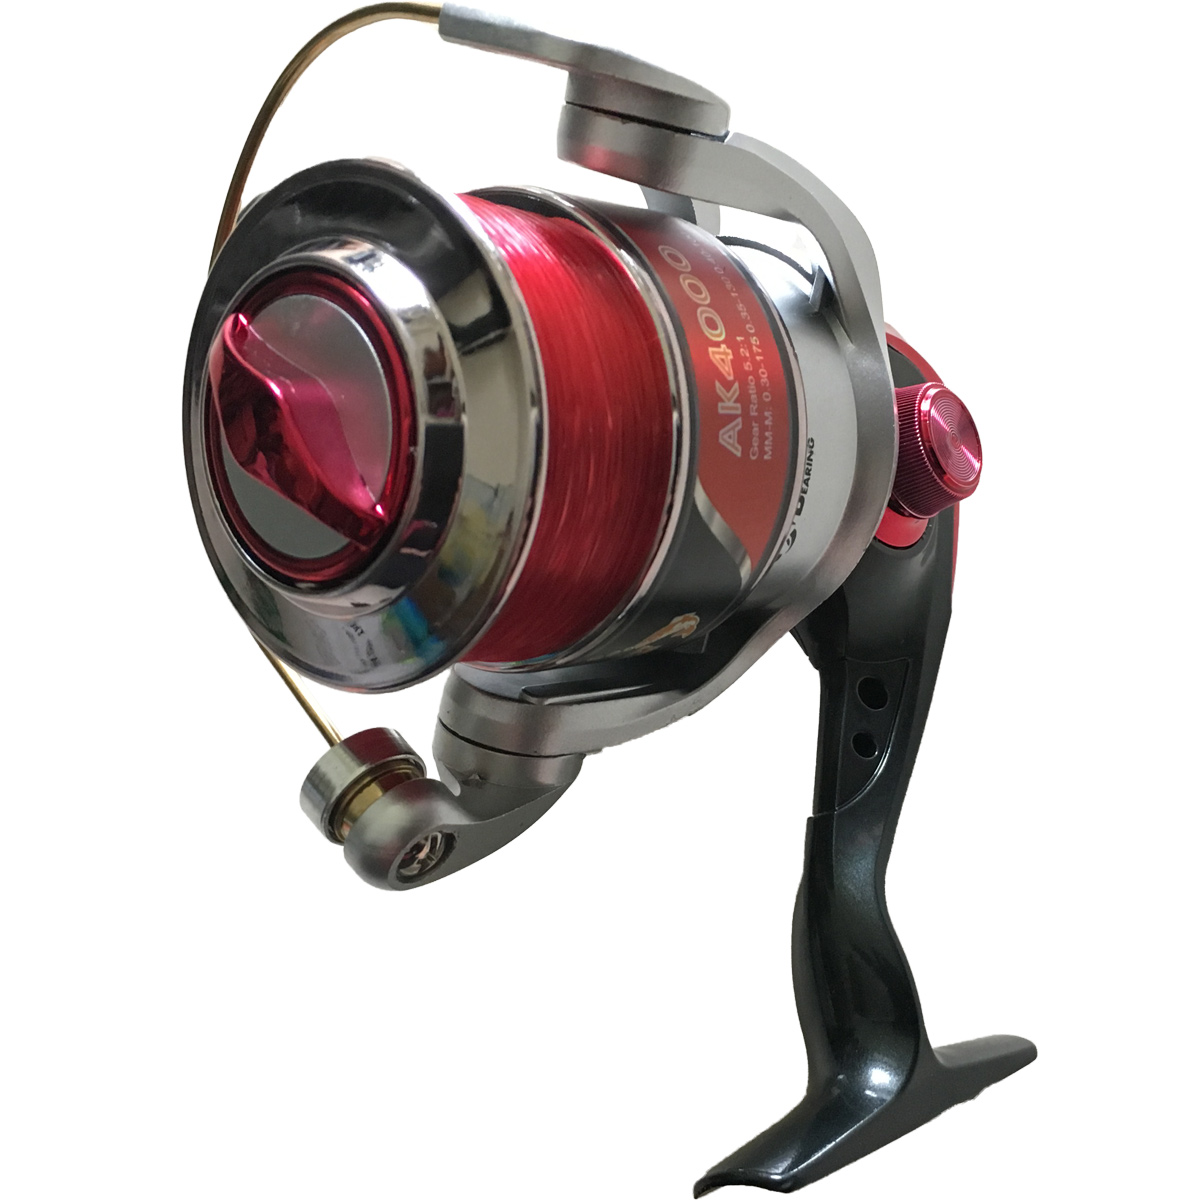 Máy Câu Happy Fish AK 4000 BH 1 Tháng